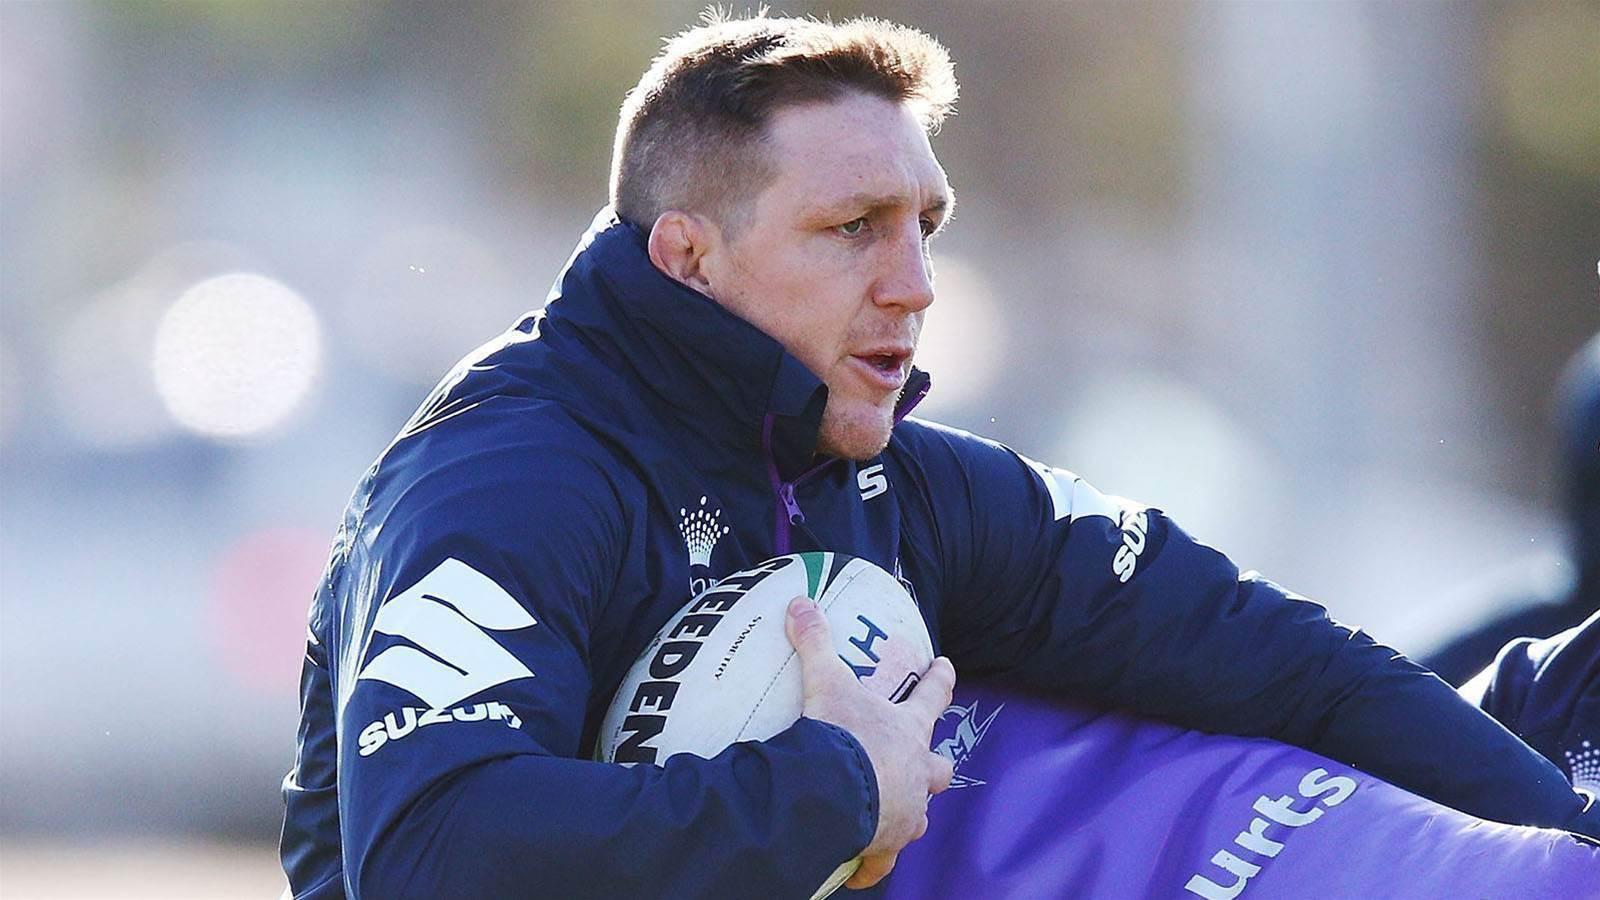 Injury could end Hoffman's career